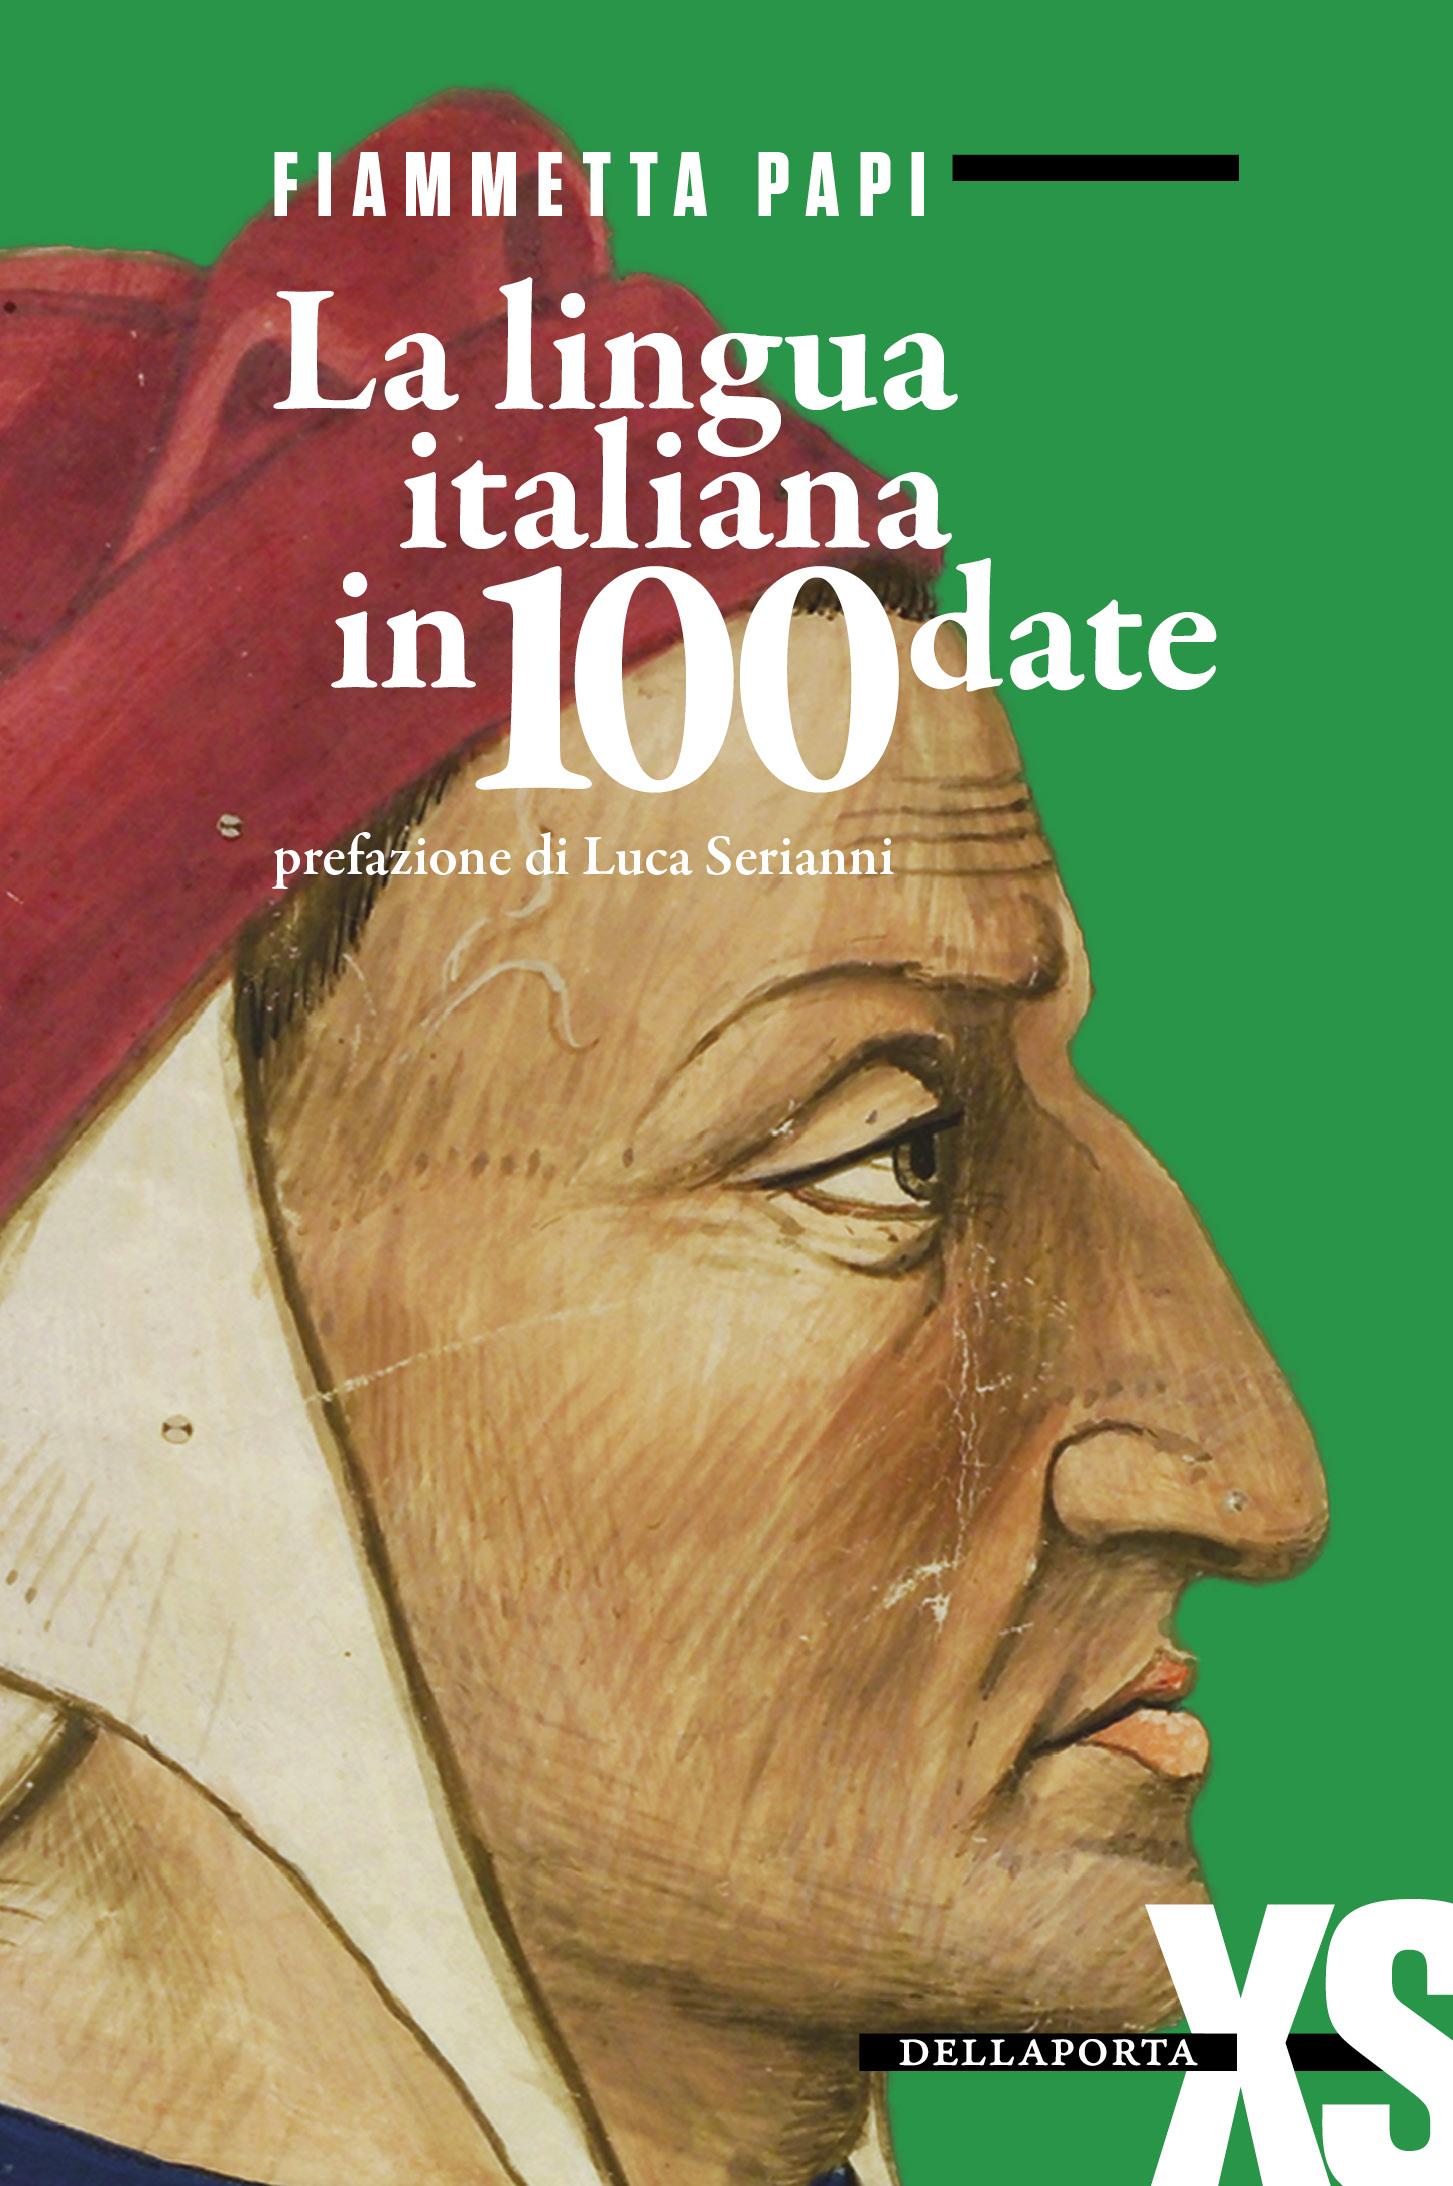 La-lingua-italiana-in-100-date-–-Fiammetta-Papi-Luca-Serianni